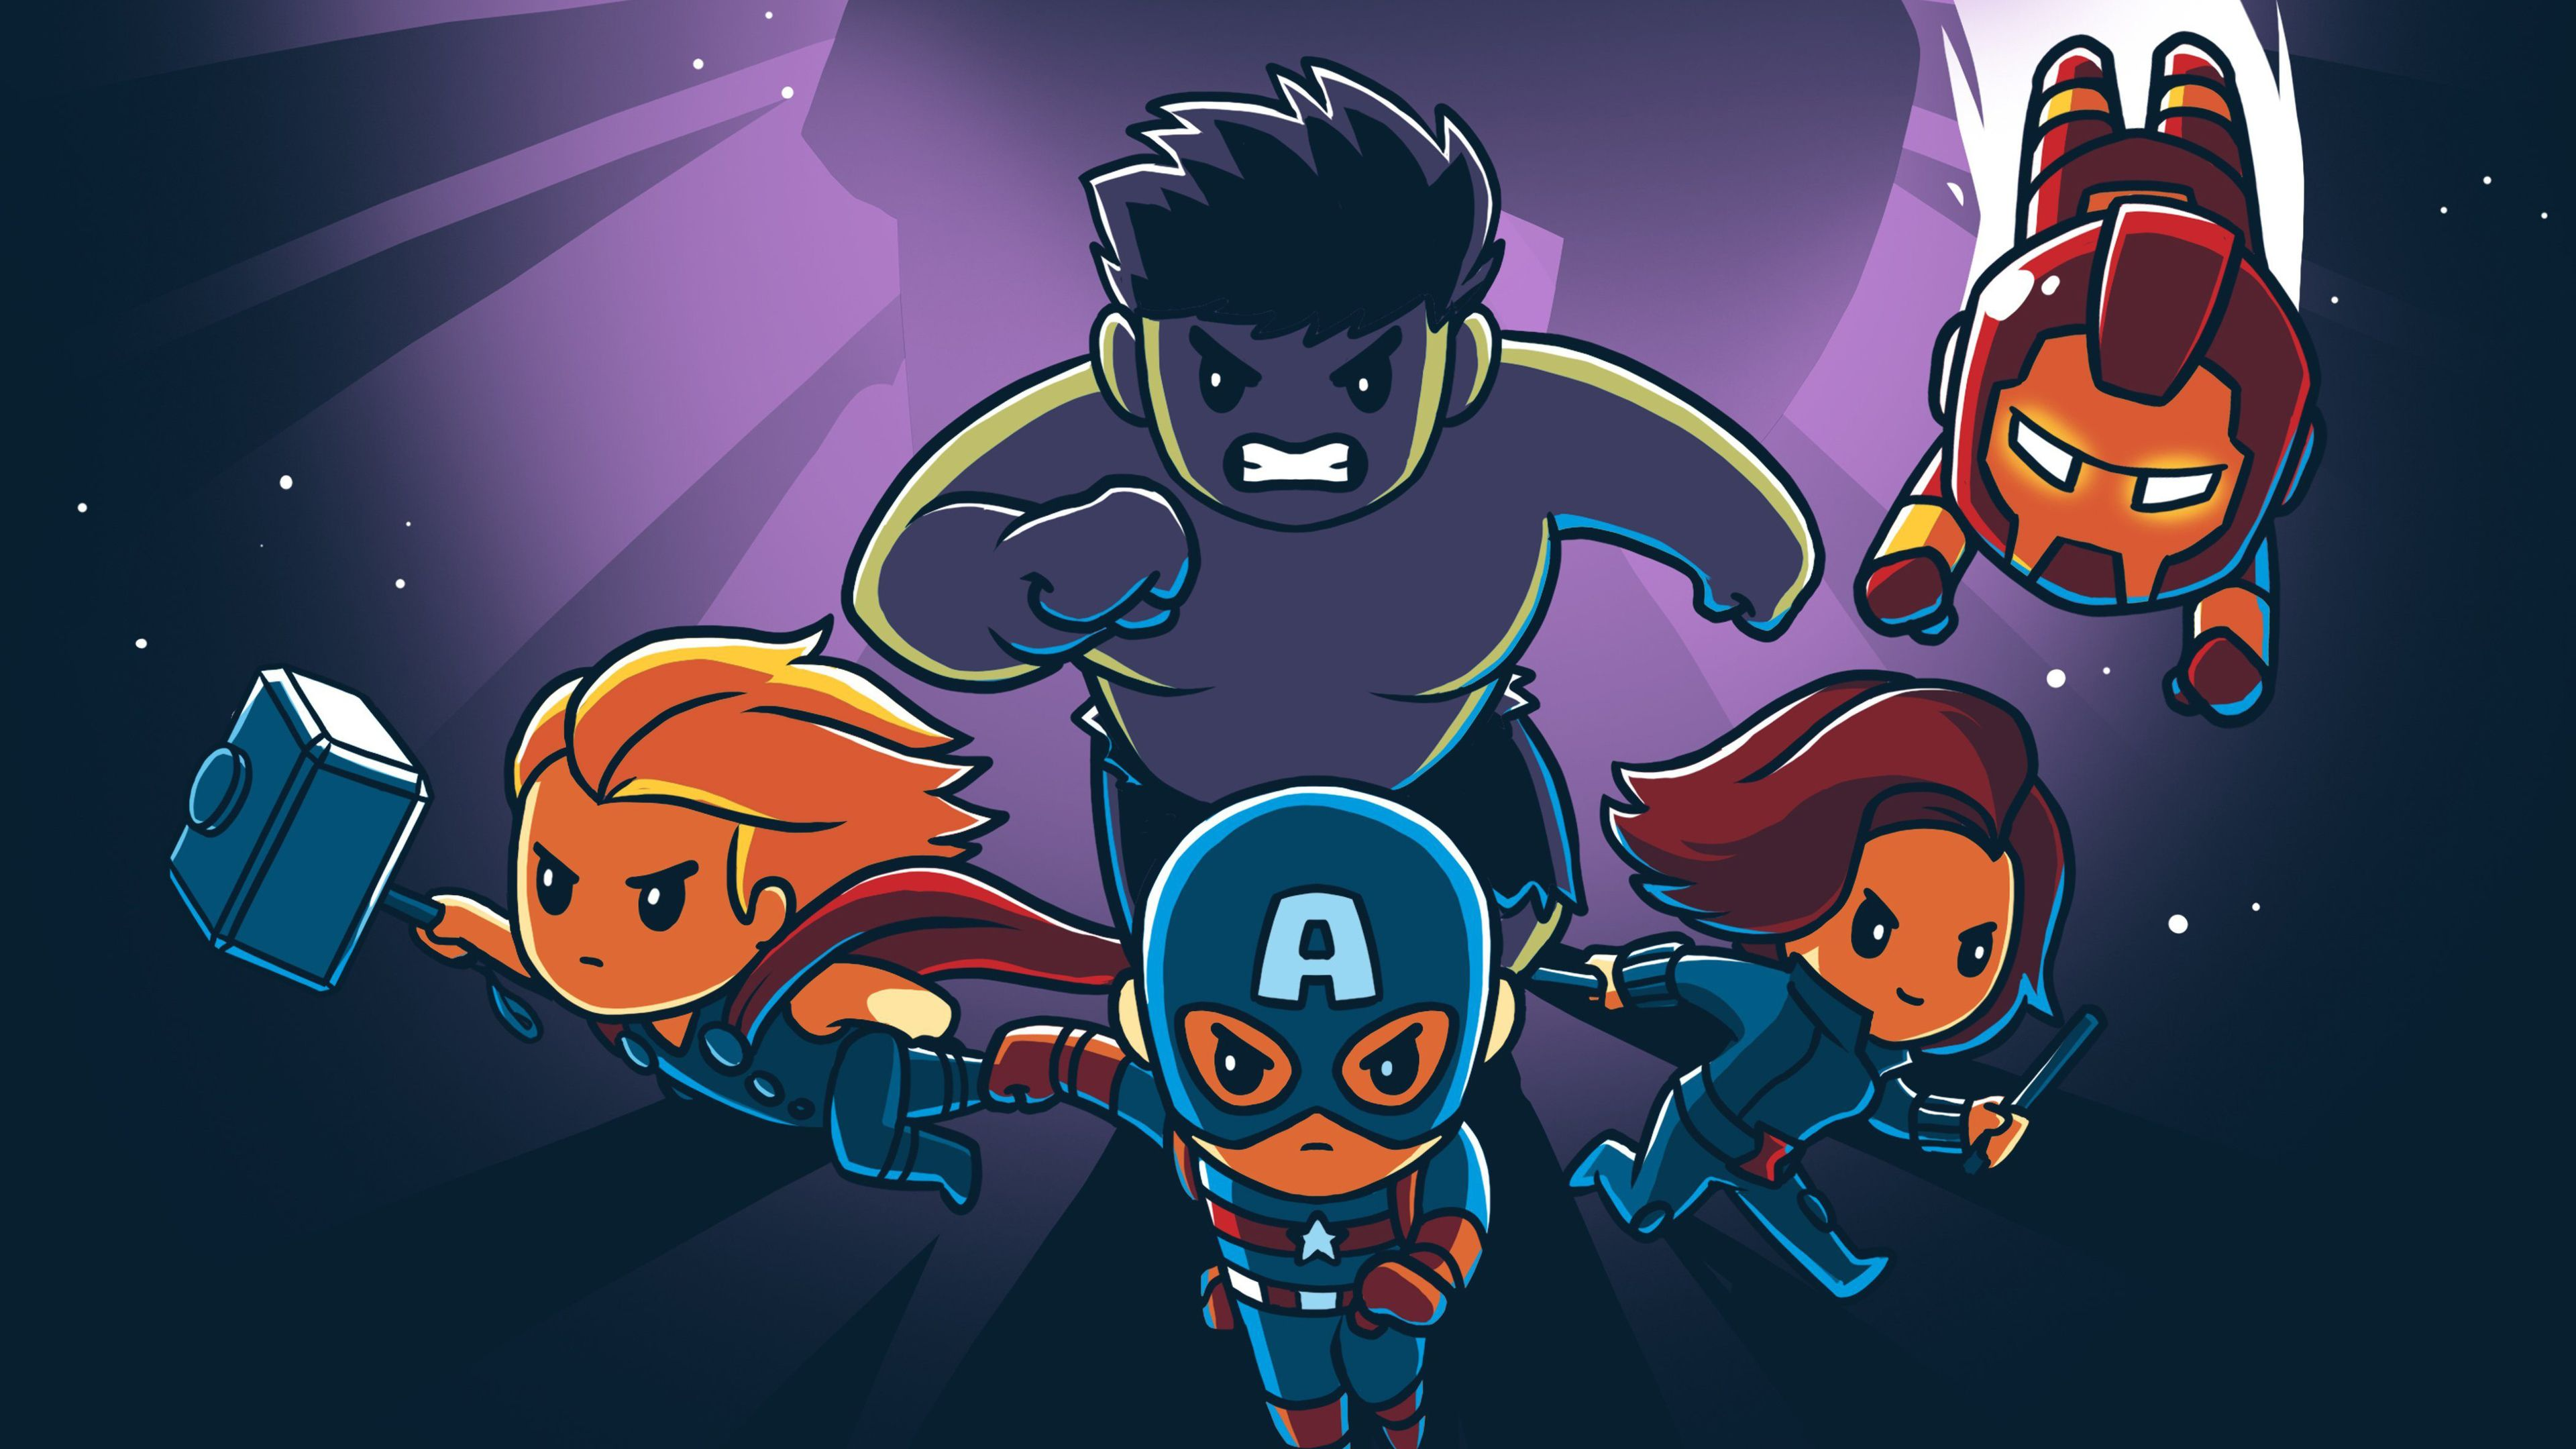 Thor Cartoon Wallpapers Top Free Thor Cartoon Backgrounds